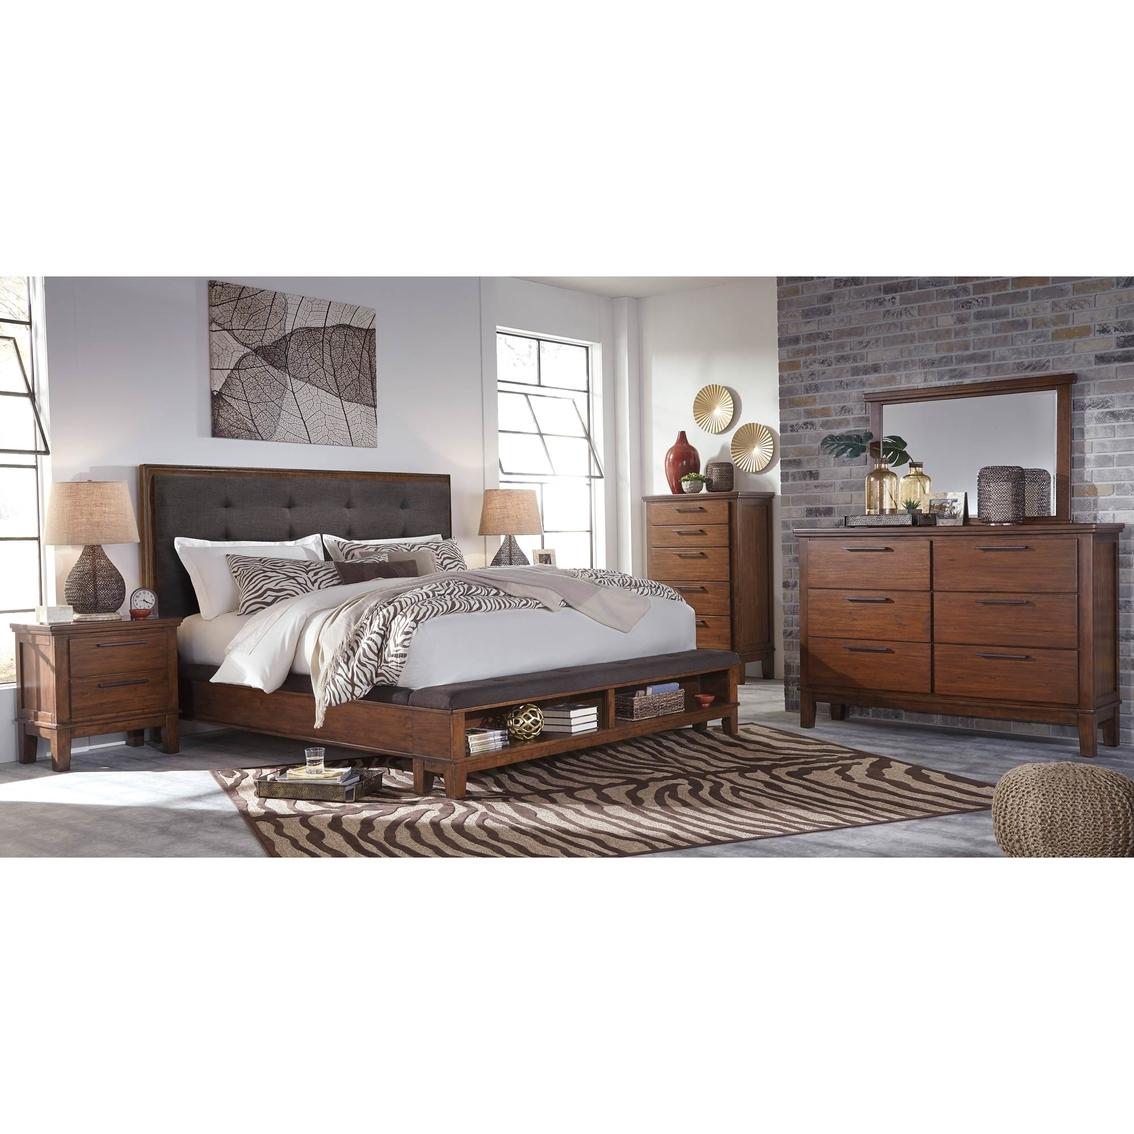 Signature design by ashley ralene 5 pc bedroom set - Bedroom furniture set online shopping ...